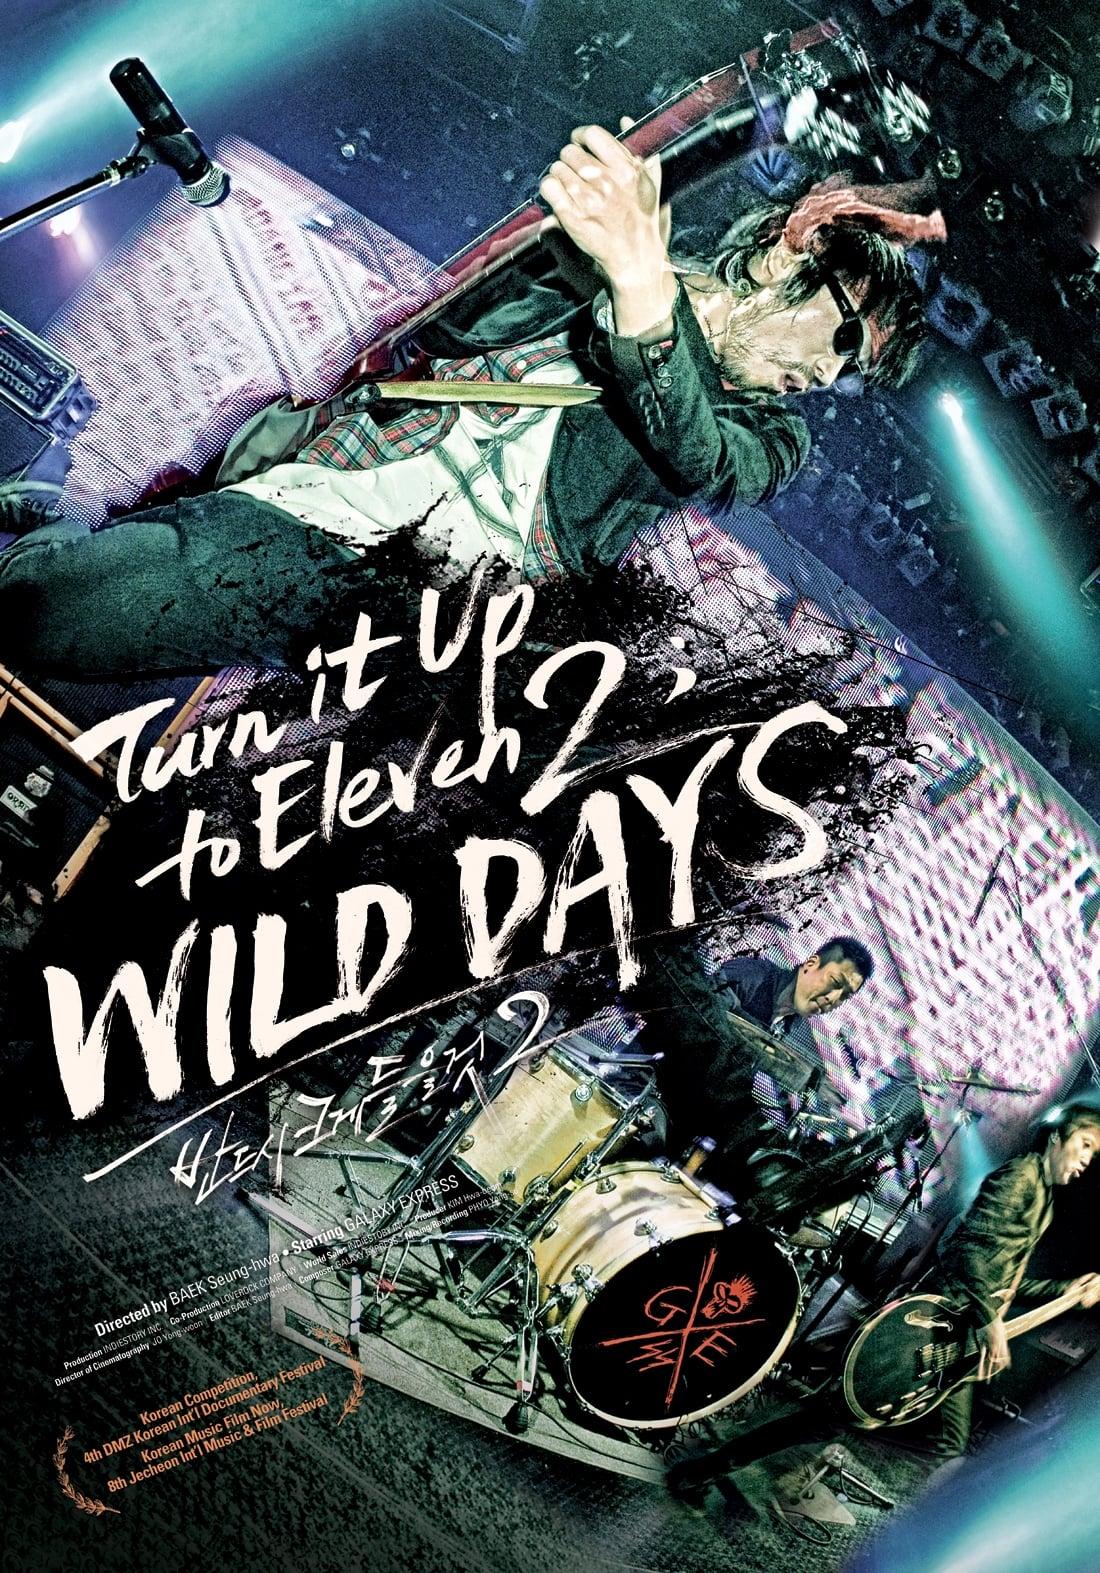 Turn It up to Eleven 2 : WILD DAYS